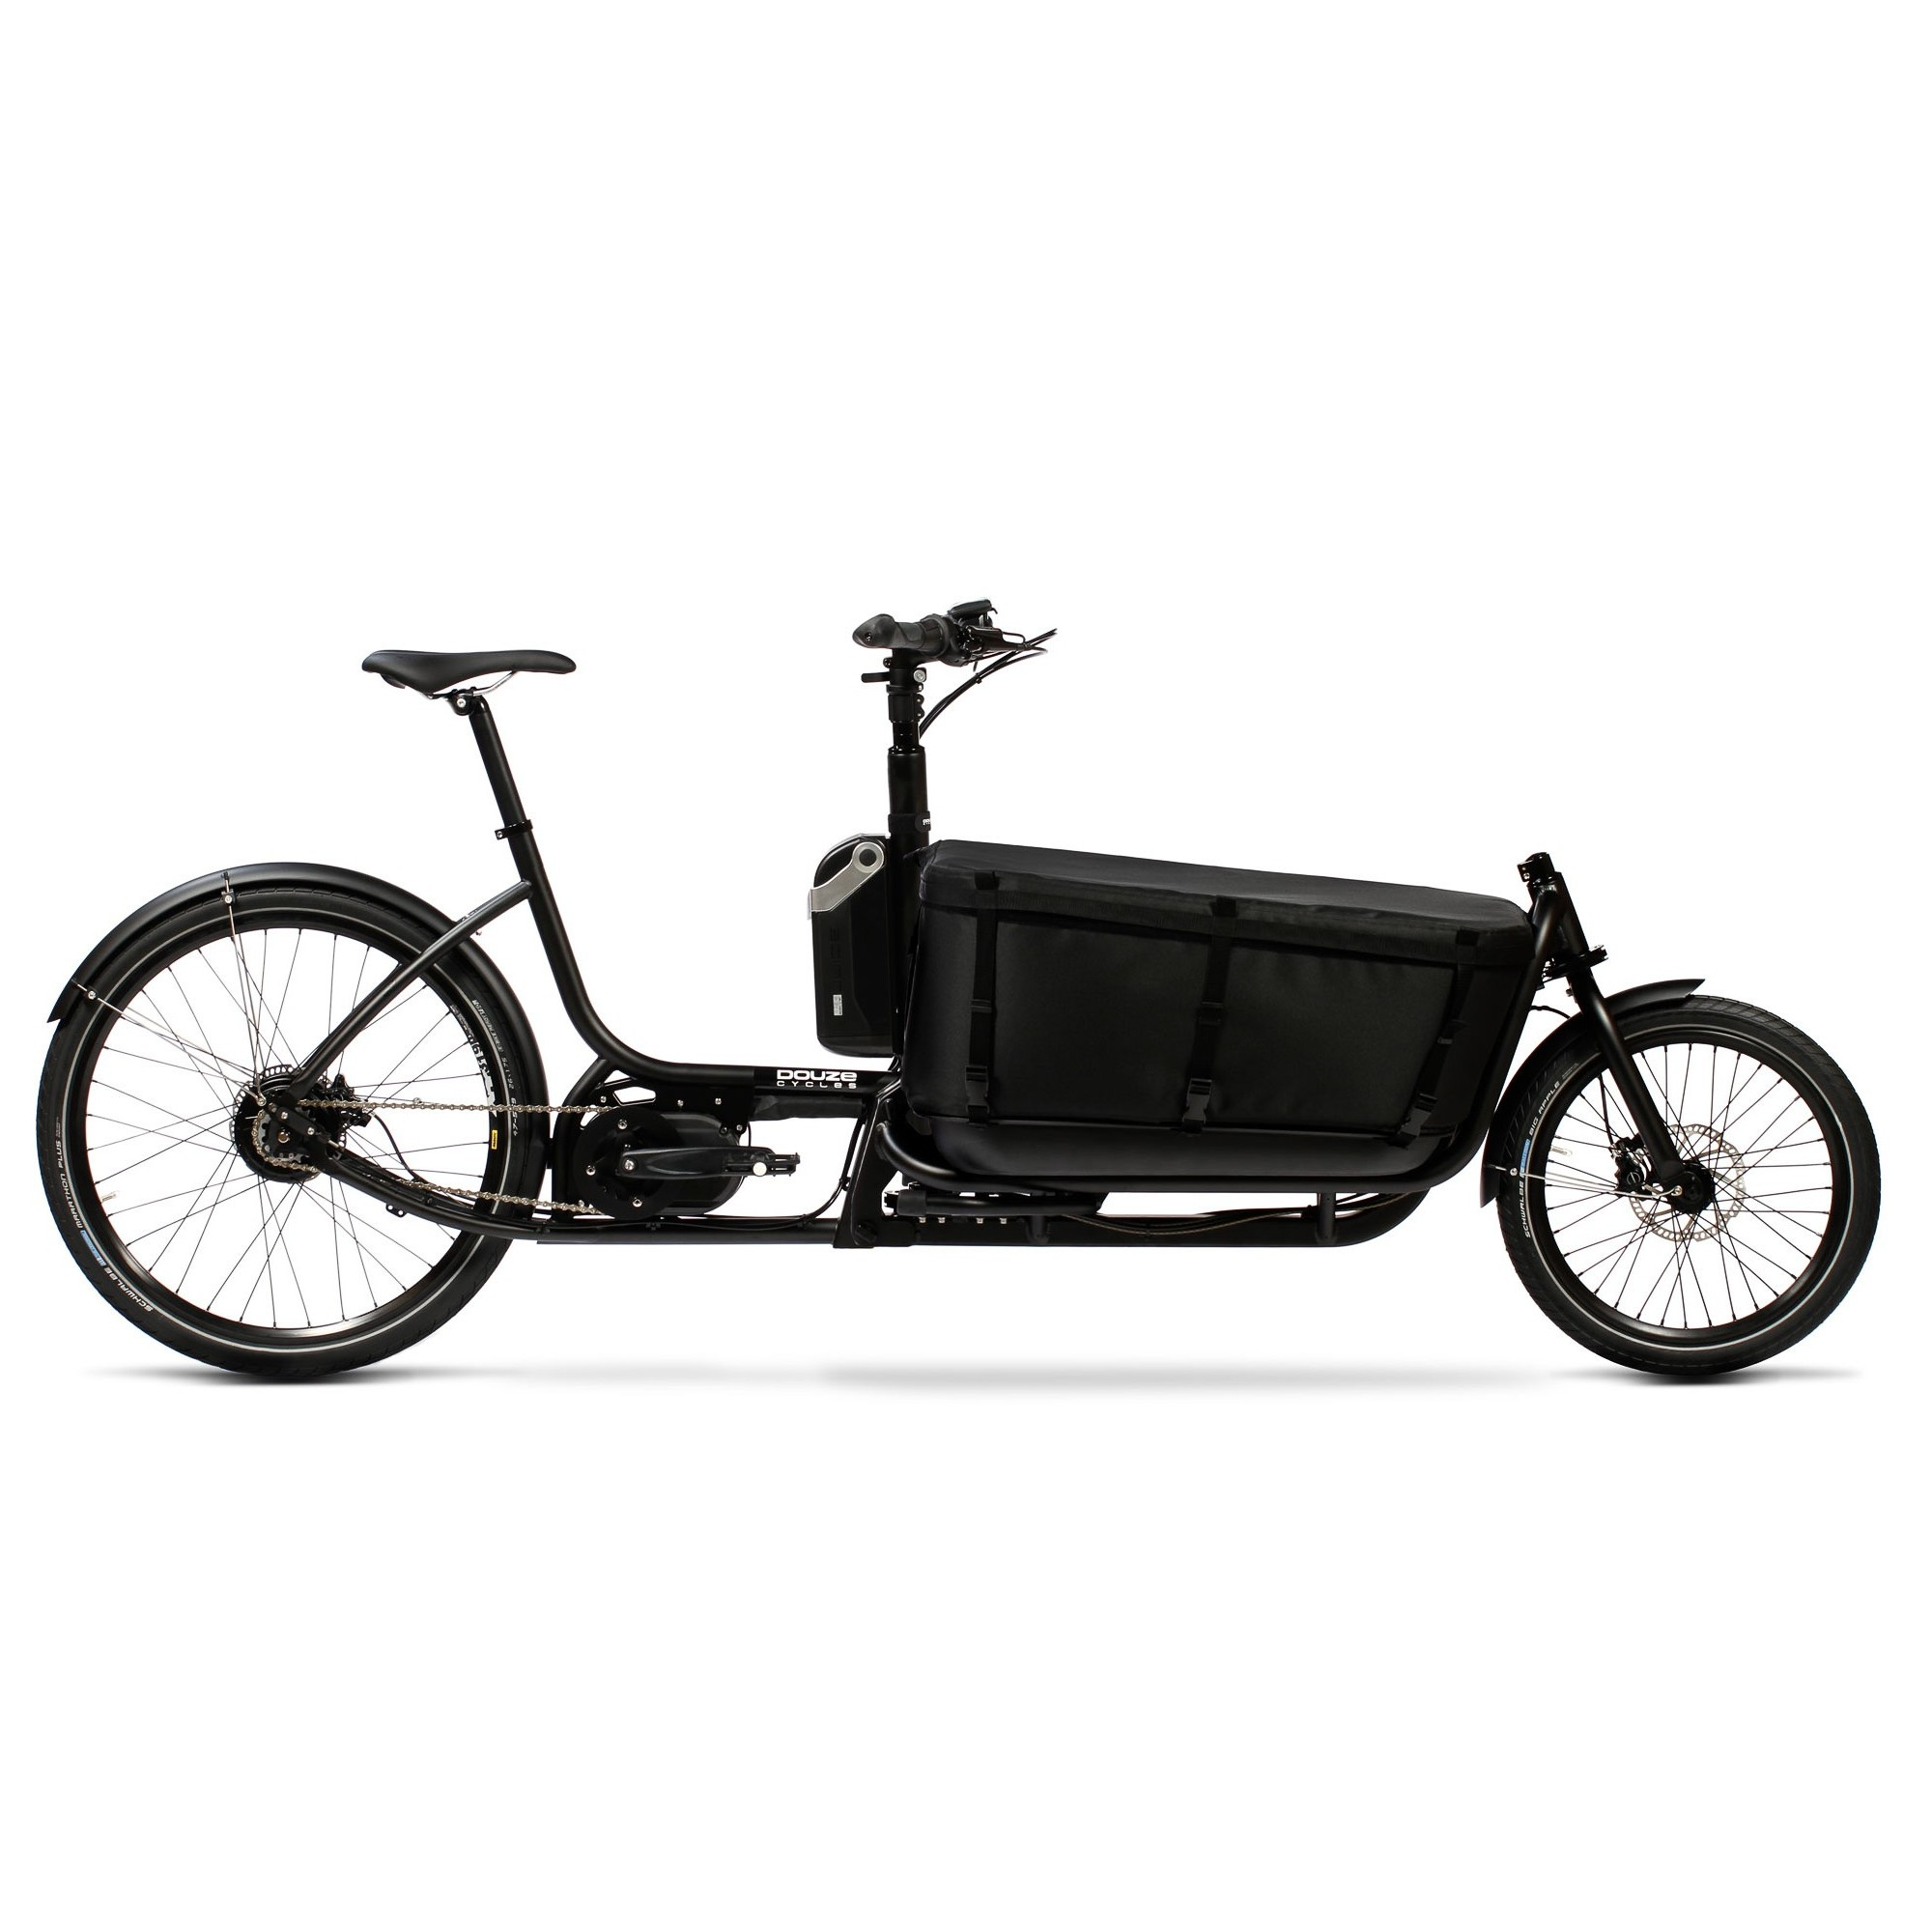 v lo lectrique cargo douze cycles f4e mpf drive v lozen v lo lectrique vttae en bretagne. Black Bedroom Furniture Sets. Home Design Ideas